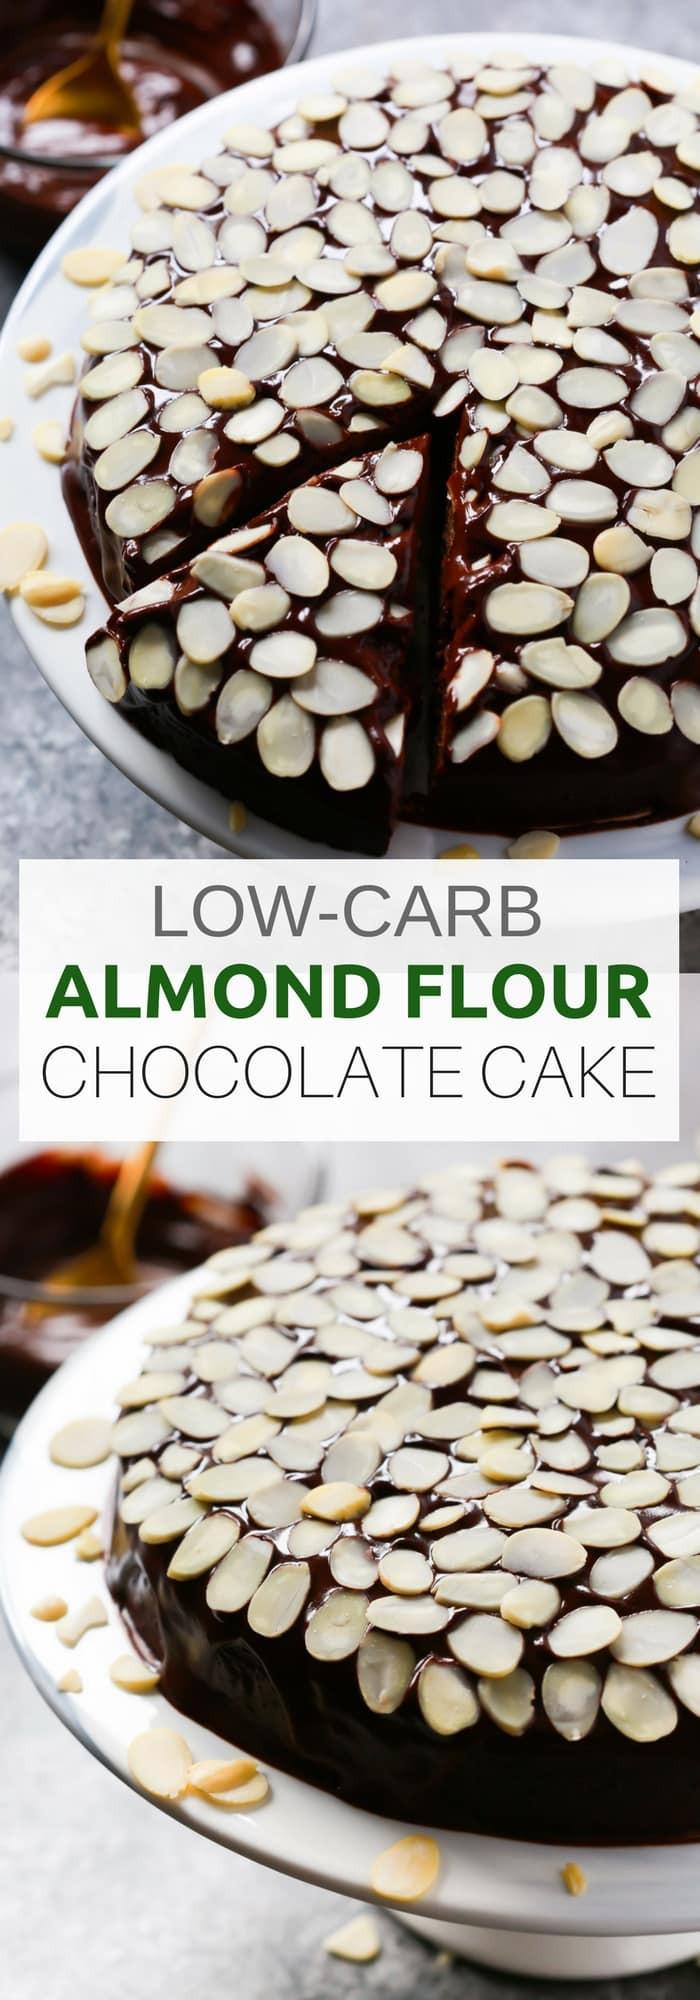 Low Carb Cocoa Powder  Low carb Almond Flour Chocolate Cake Primavera Kitchen